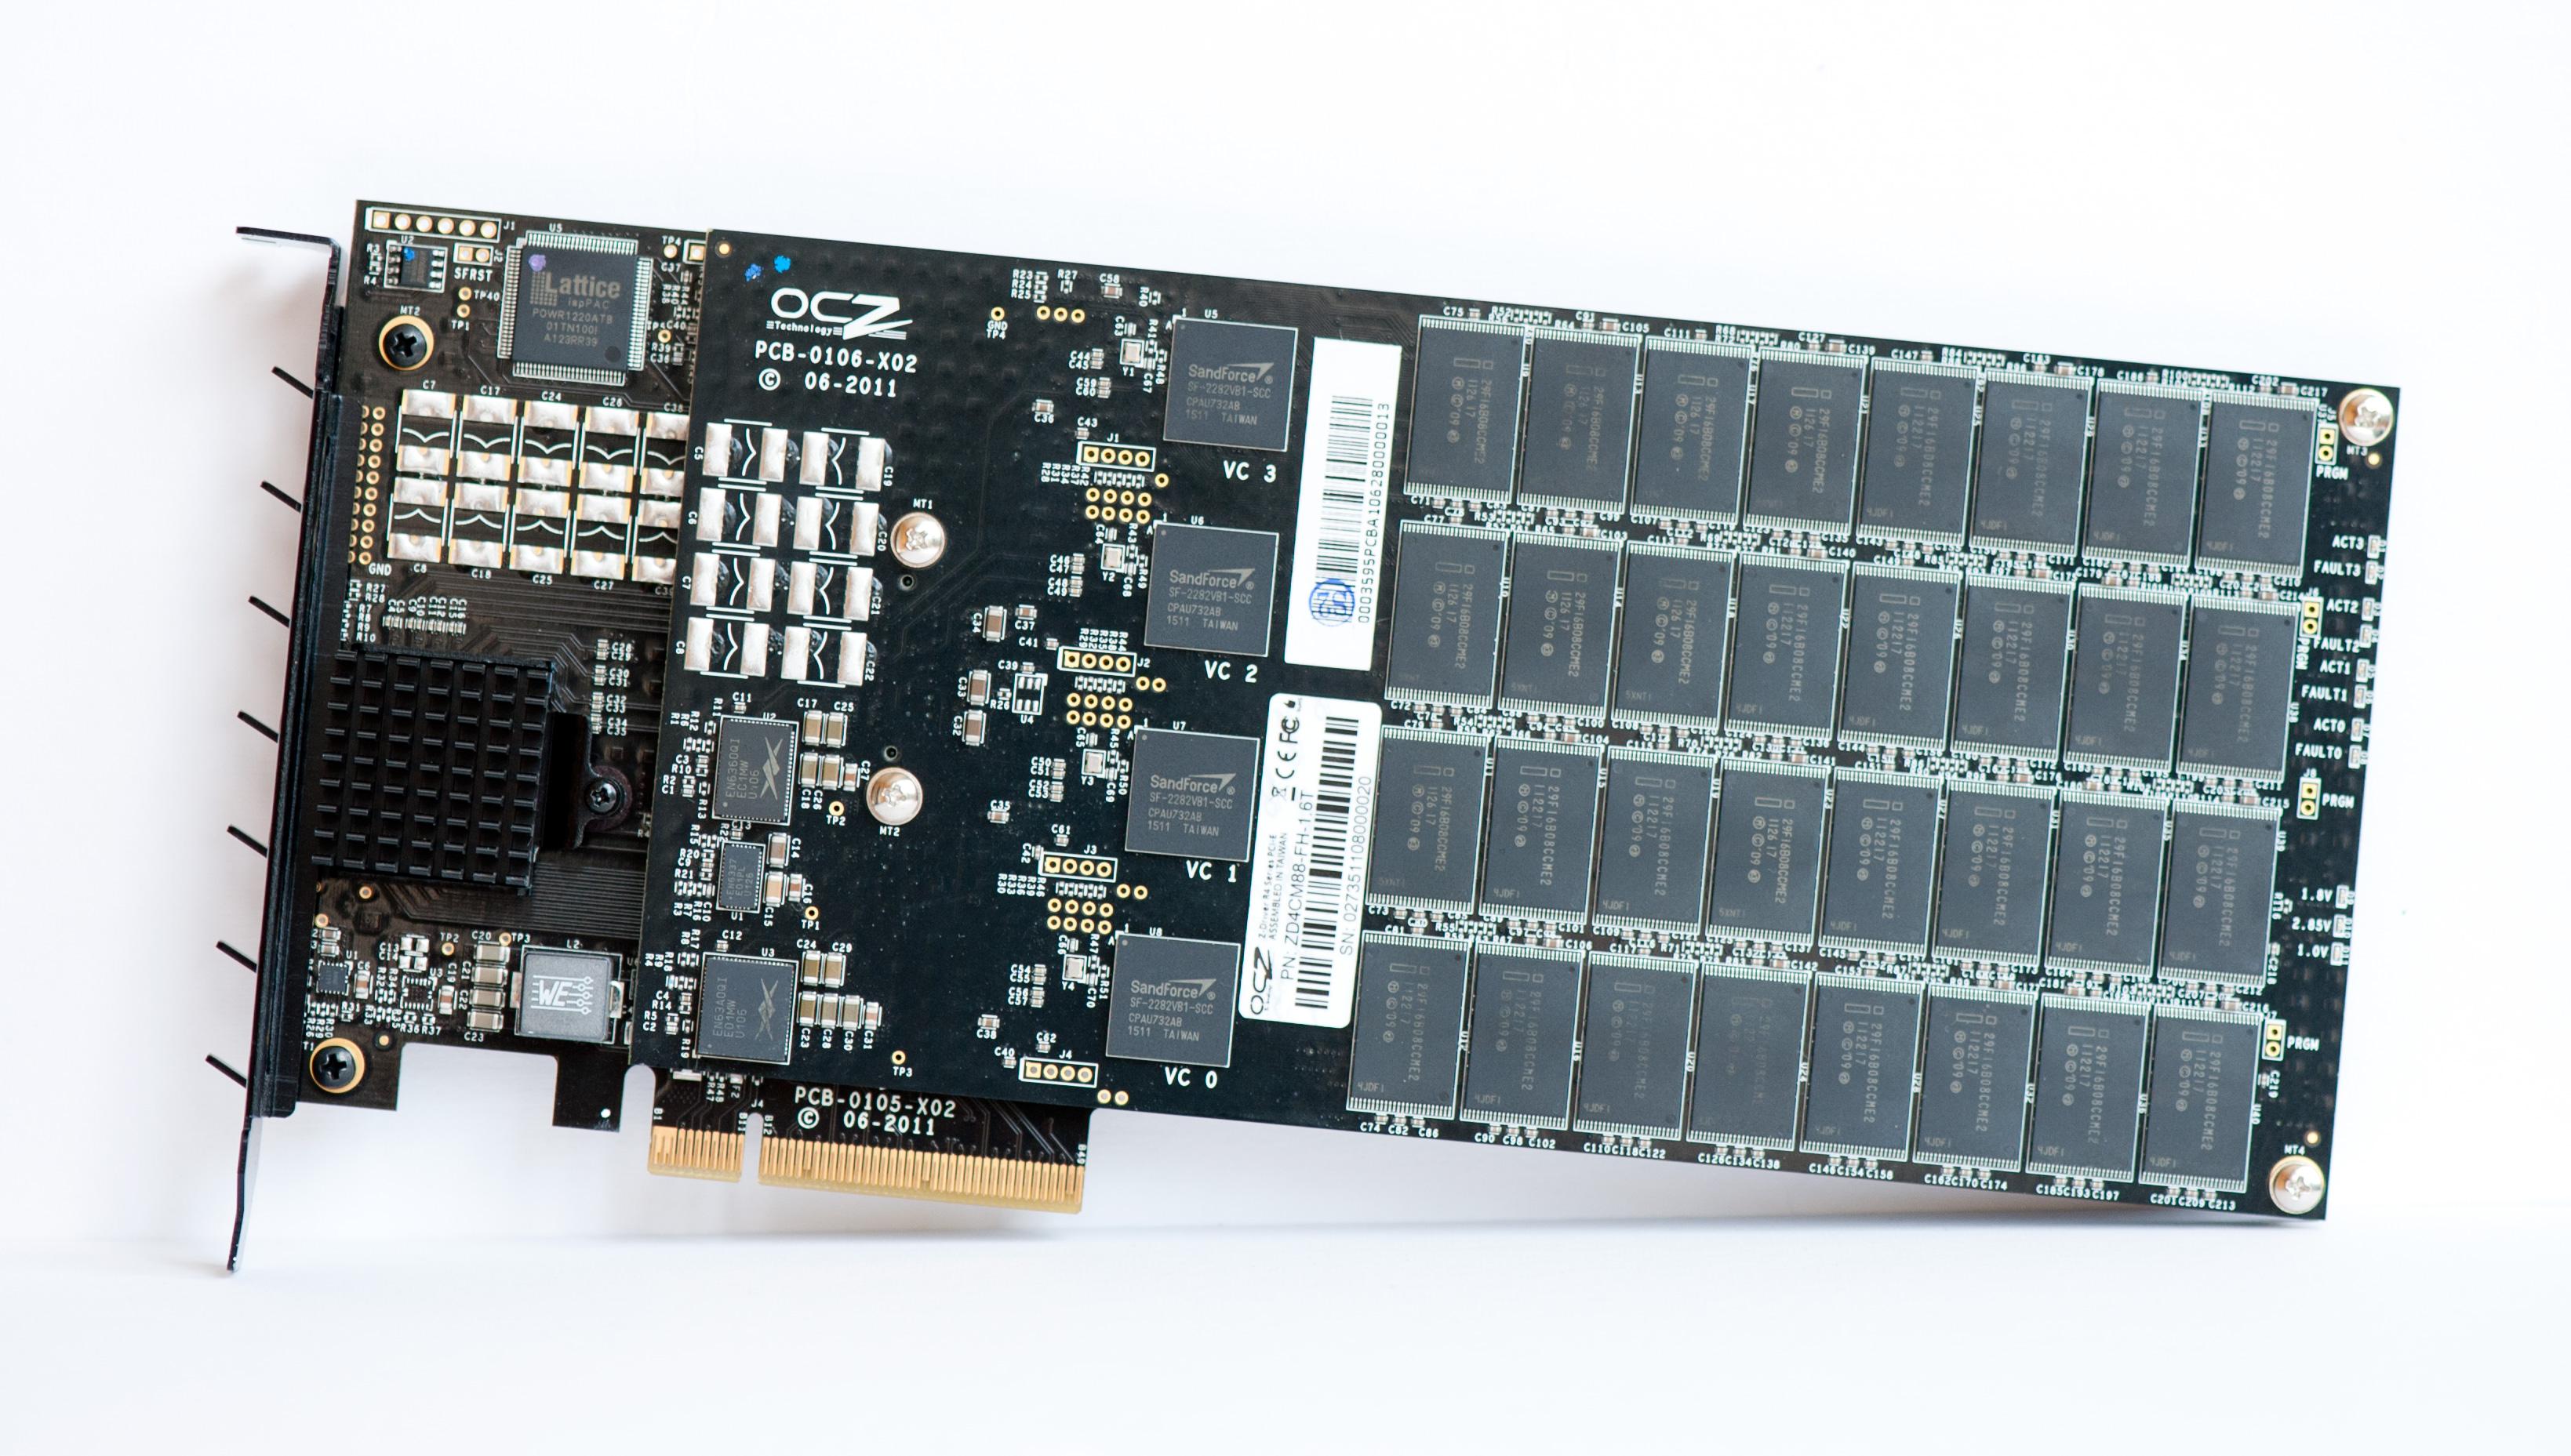 OCZ Z-Drive R4 CM88 (1.6TB PCIe SSD) Review